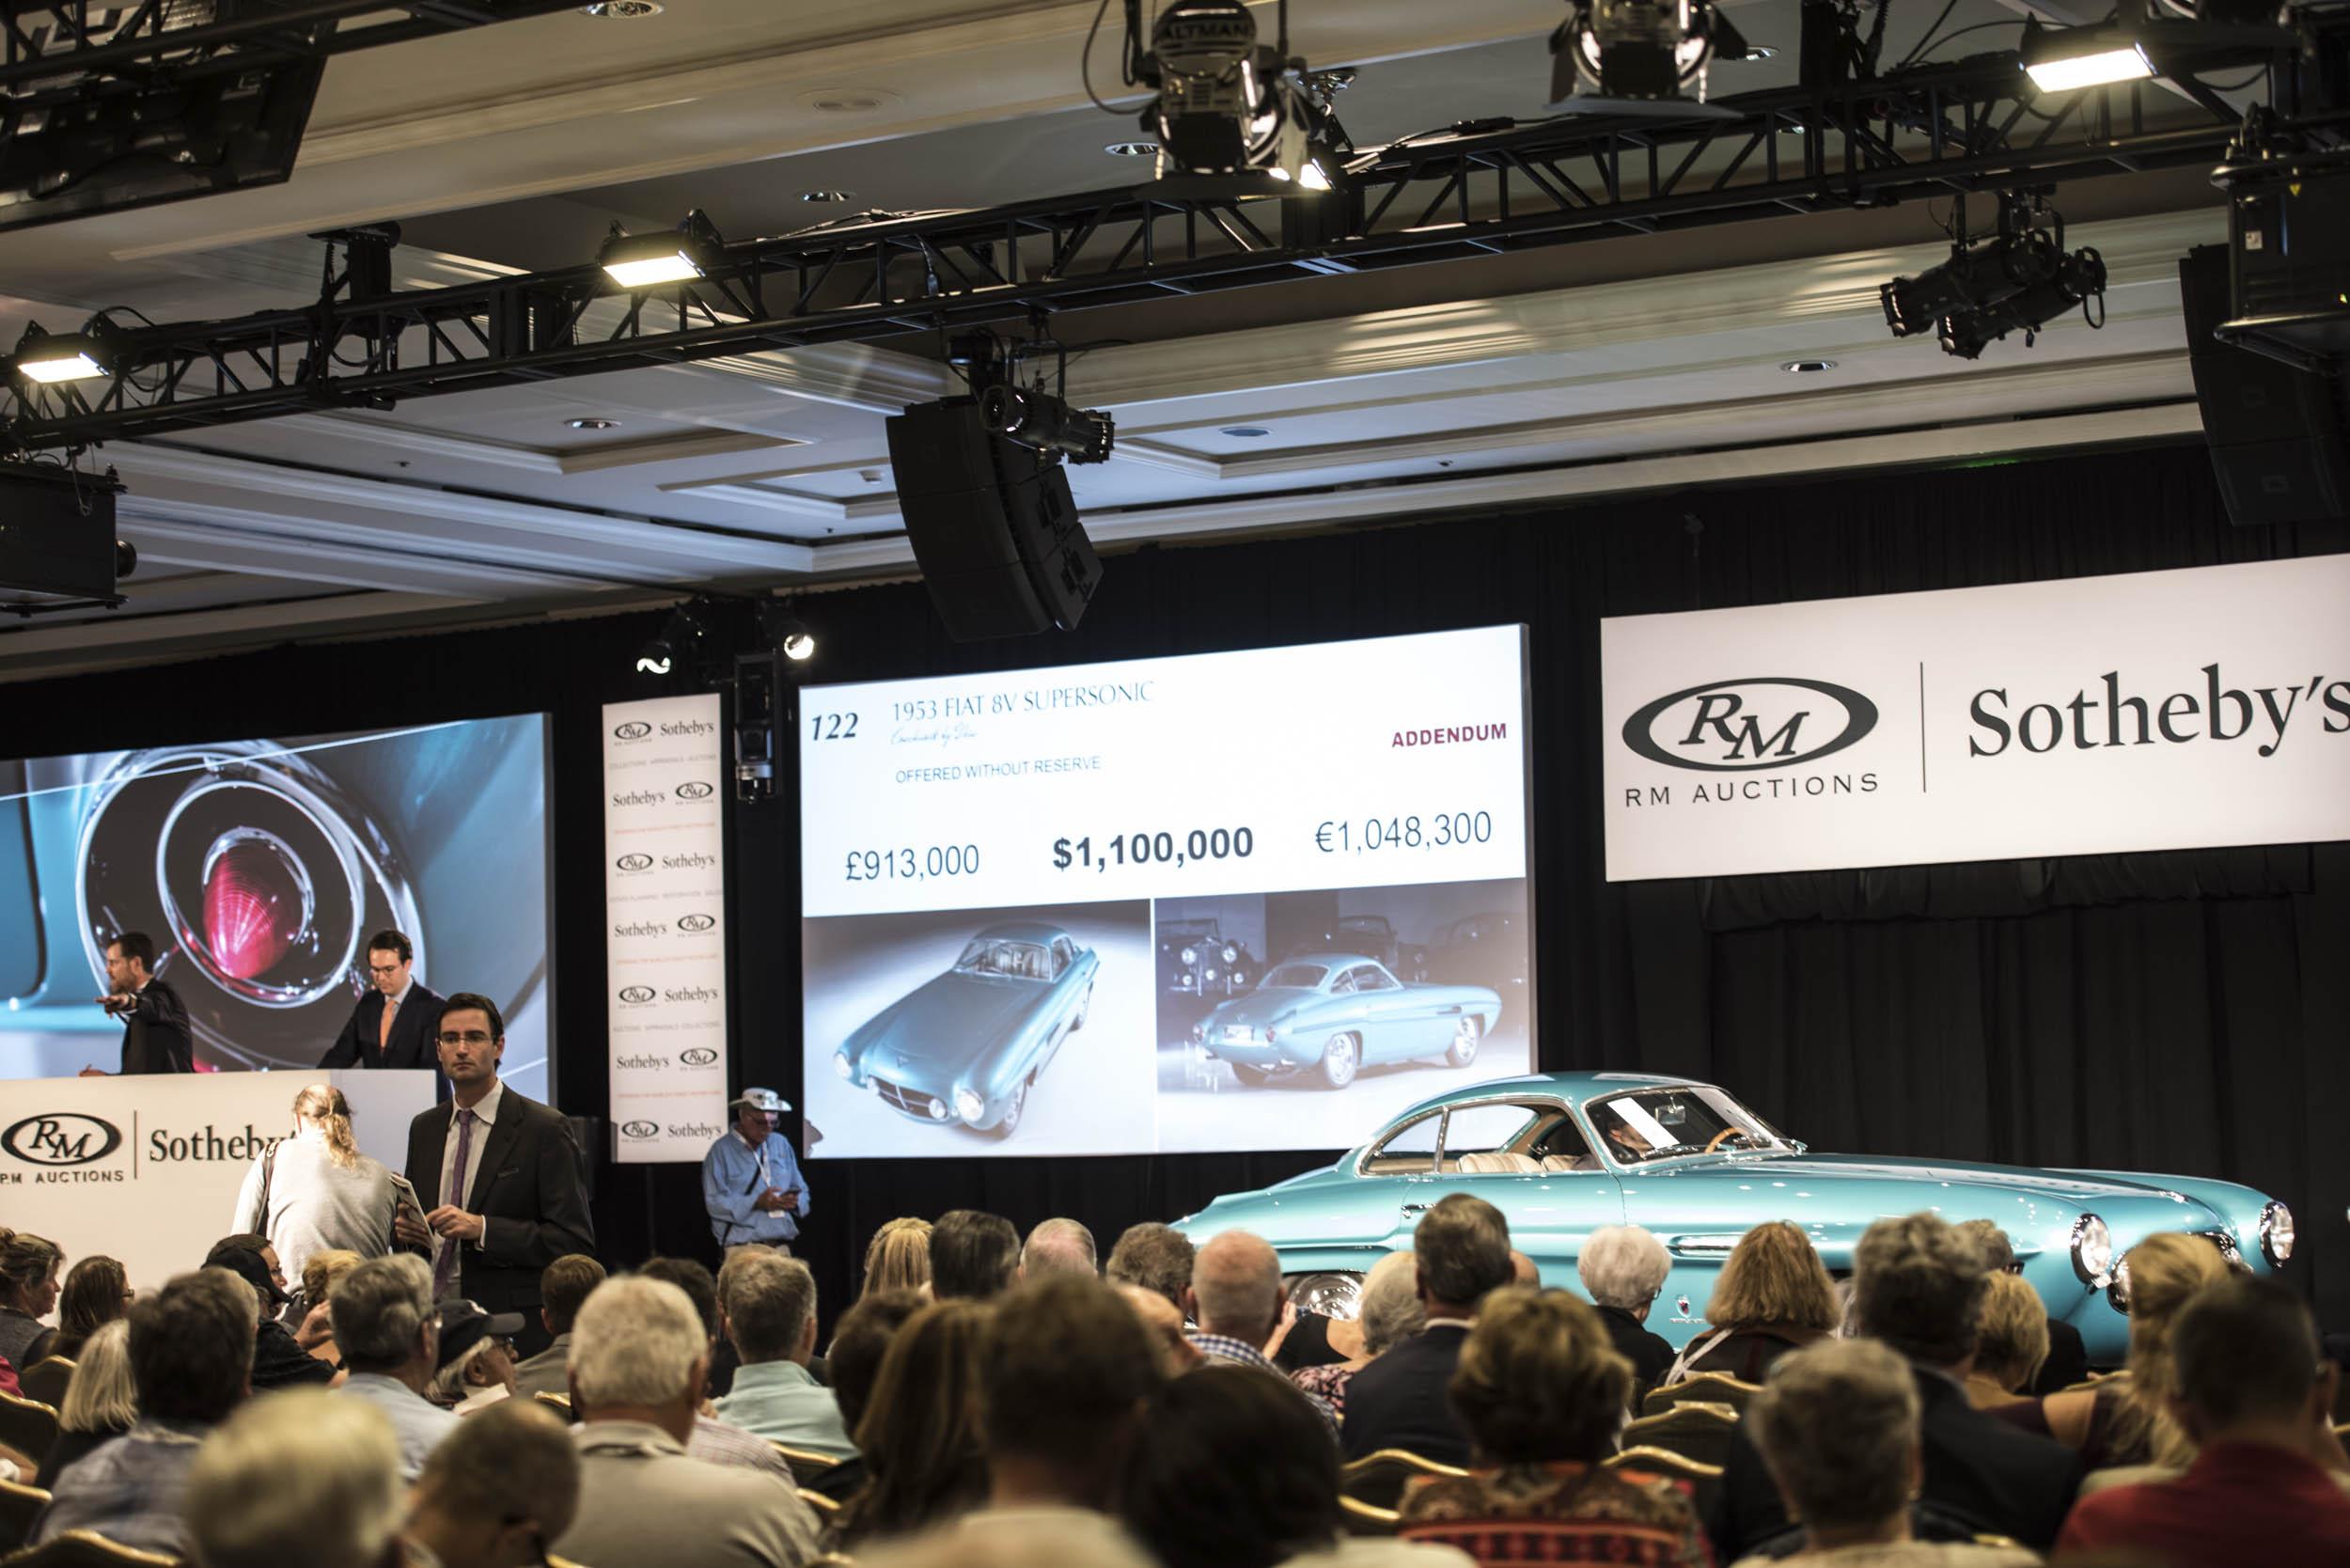 2017 Amelia Island RM Auction 1953 Fiat 8V Supersonic sale